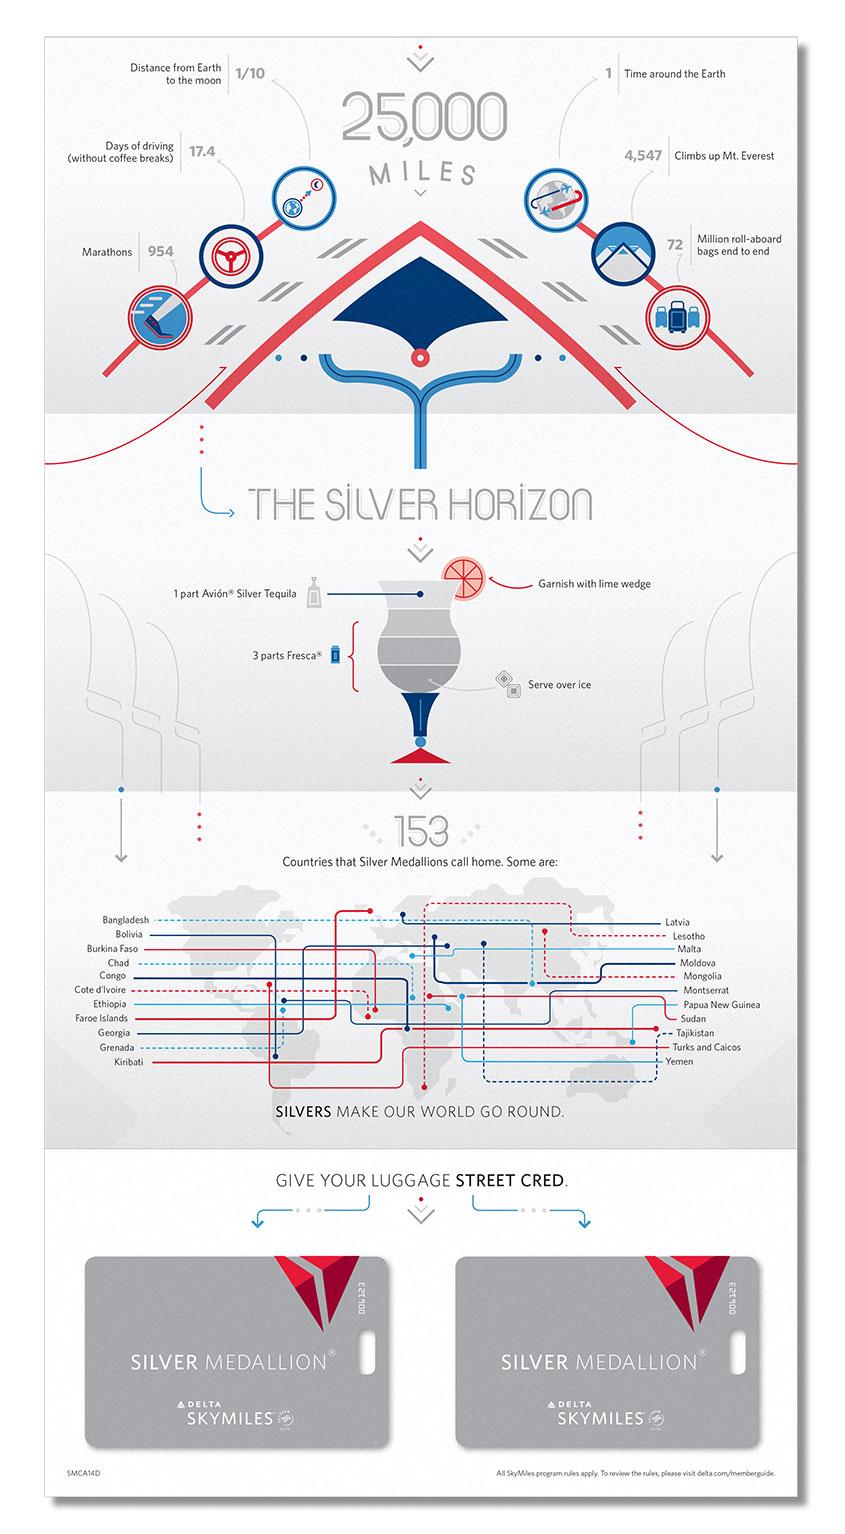 leandro-castelao-infographic-Brochures_Silver_905.jpg